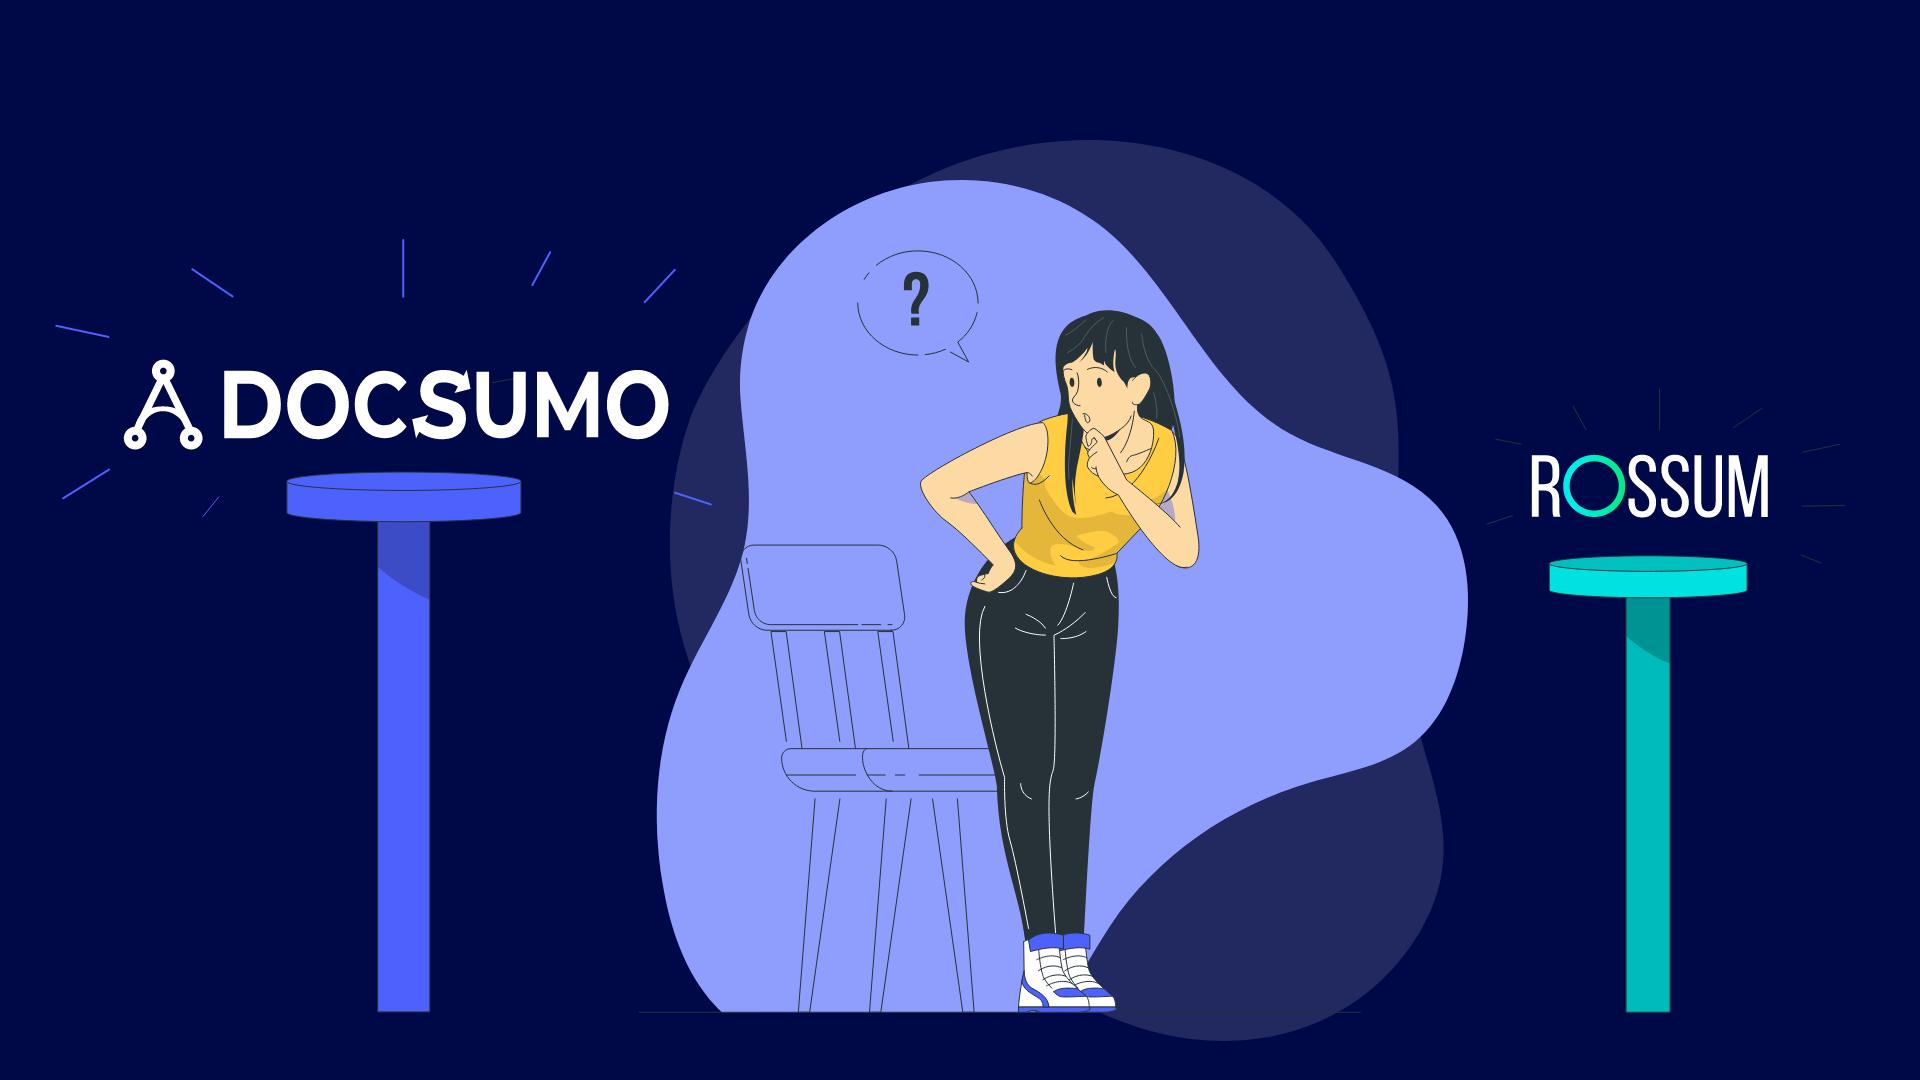 Is Docsumo a good alternative to Rossum?